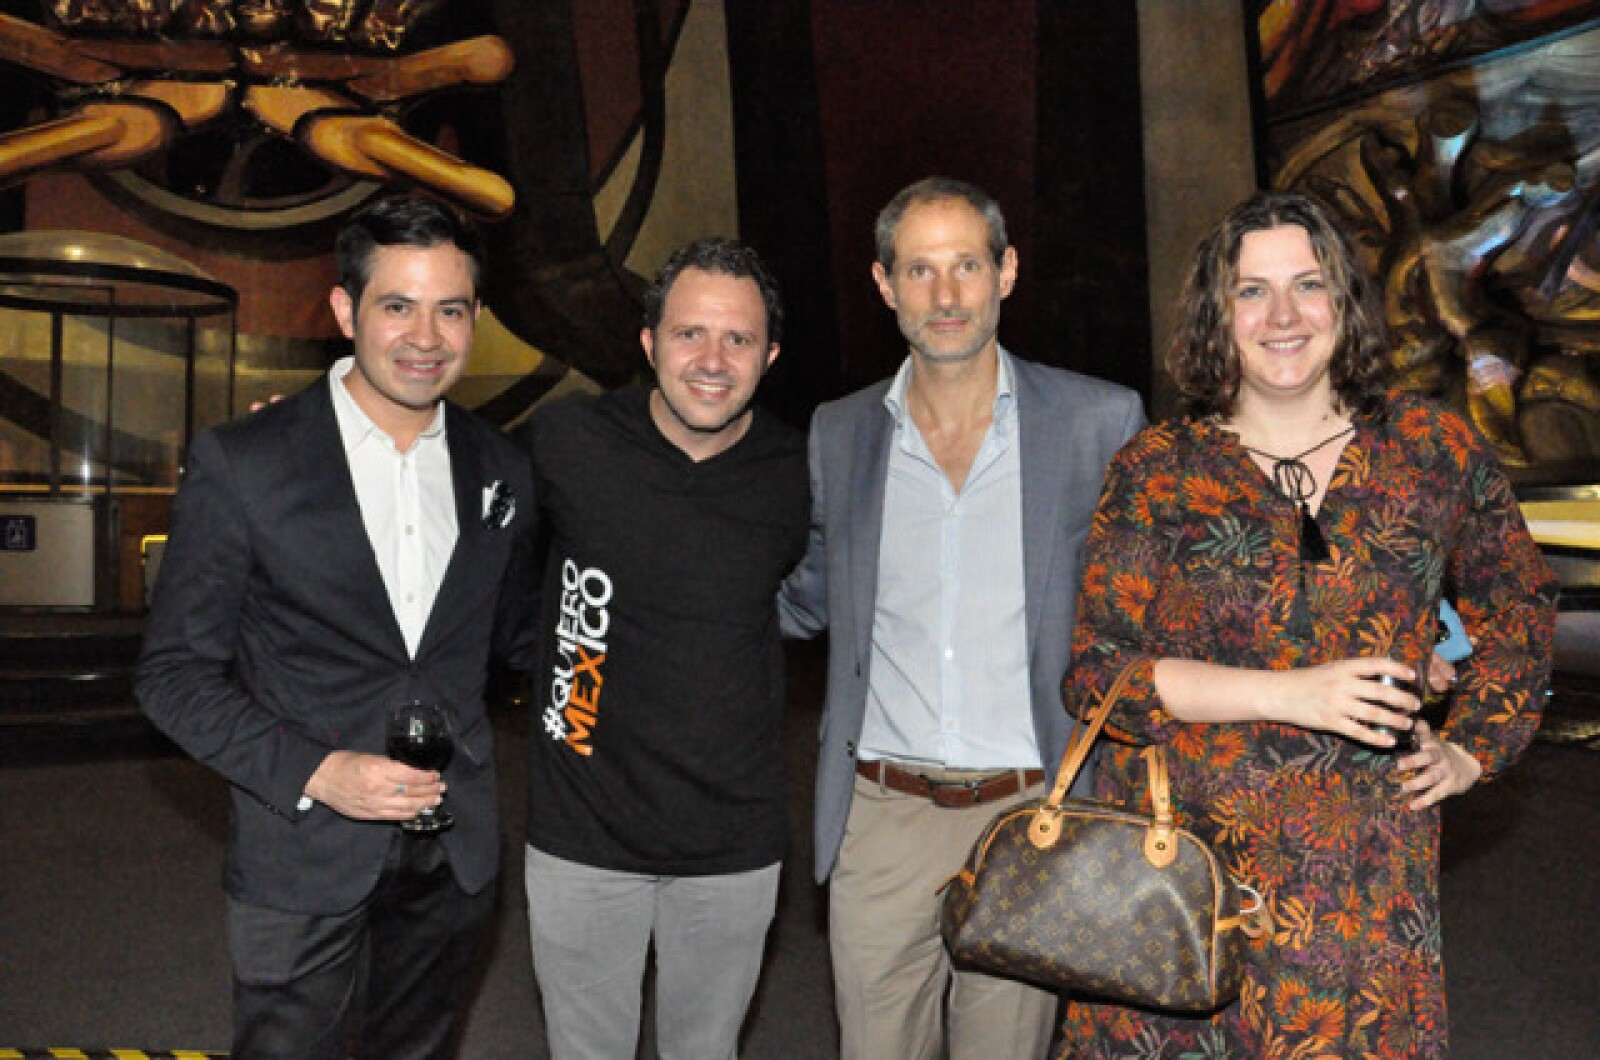 Guillermo Aguilar,Eduardo Gorospe,Dario Okrent y Perla Urkijo